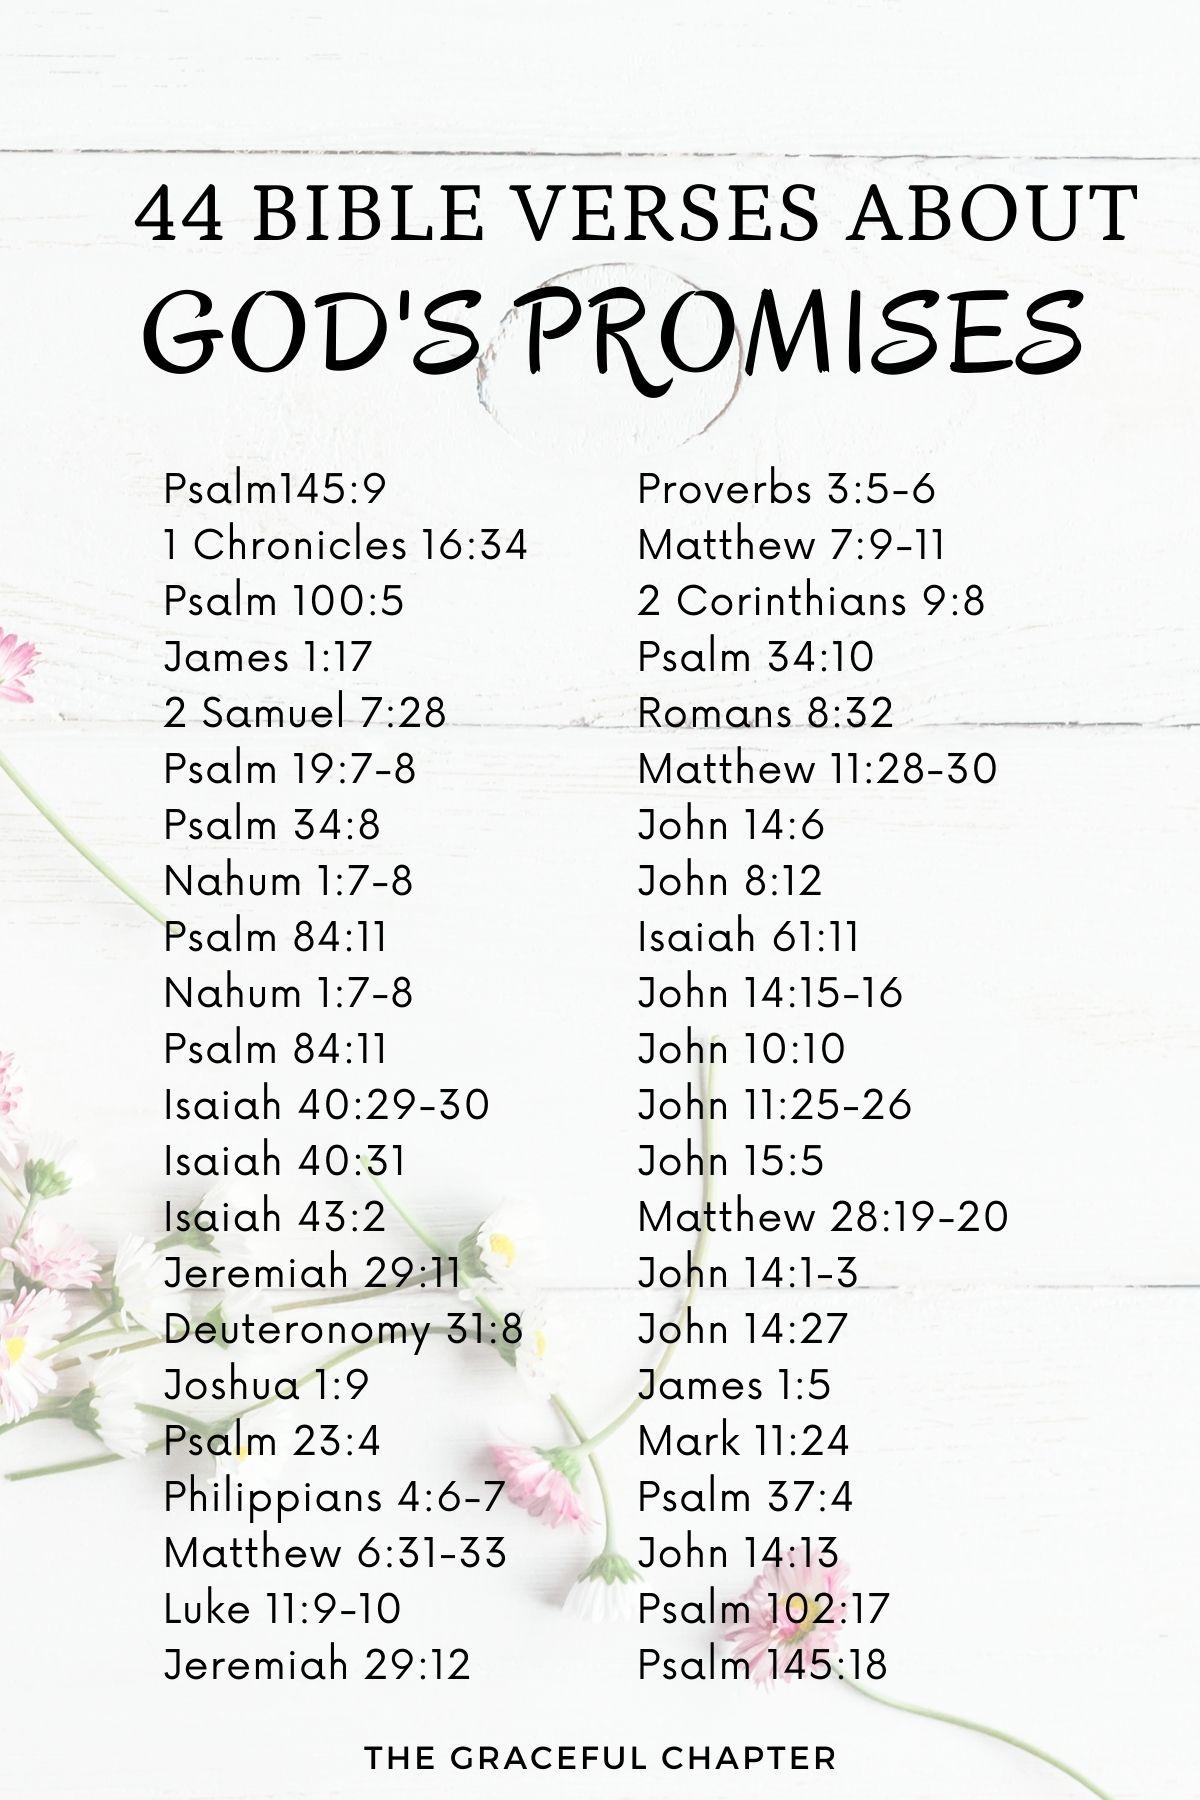 44 Bible verses about God's promises